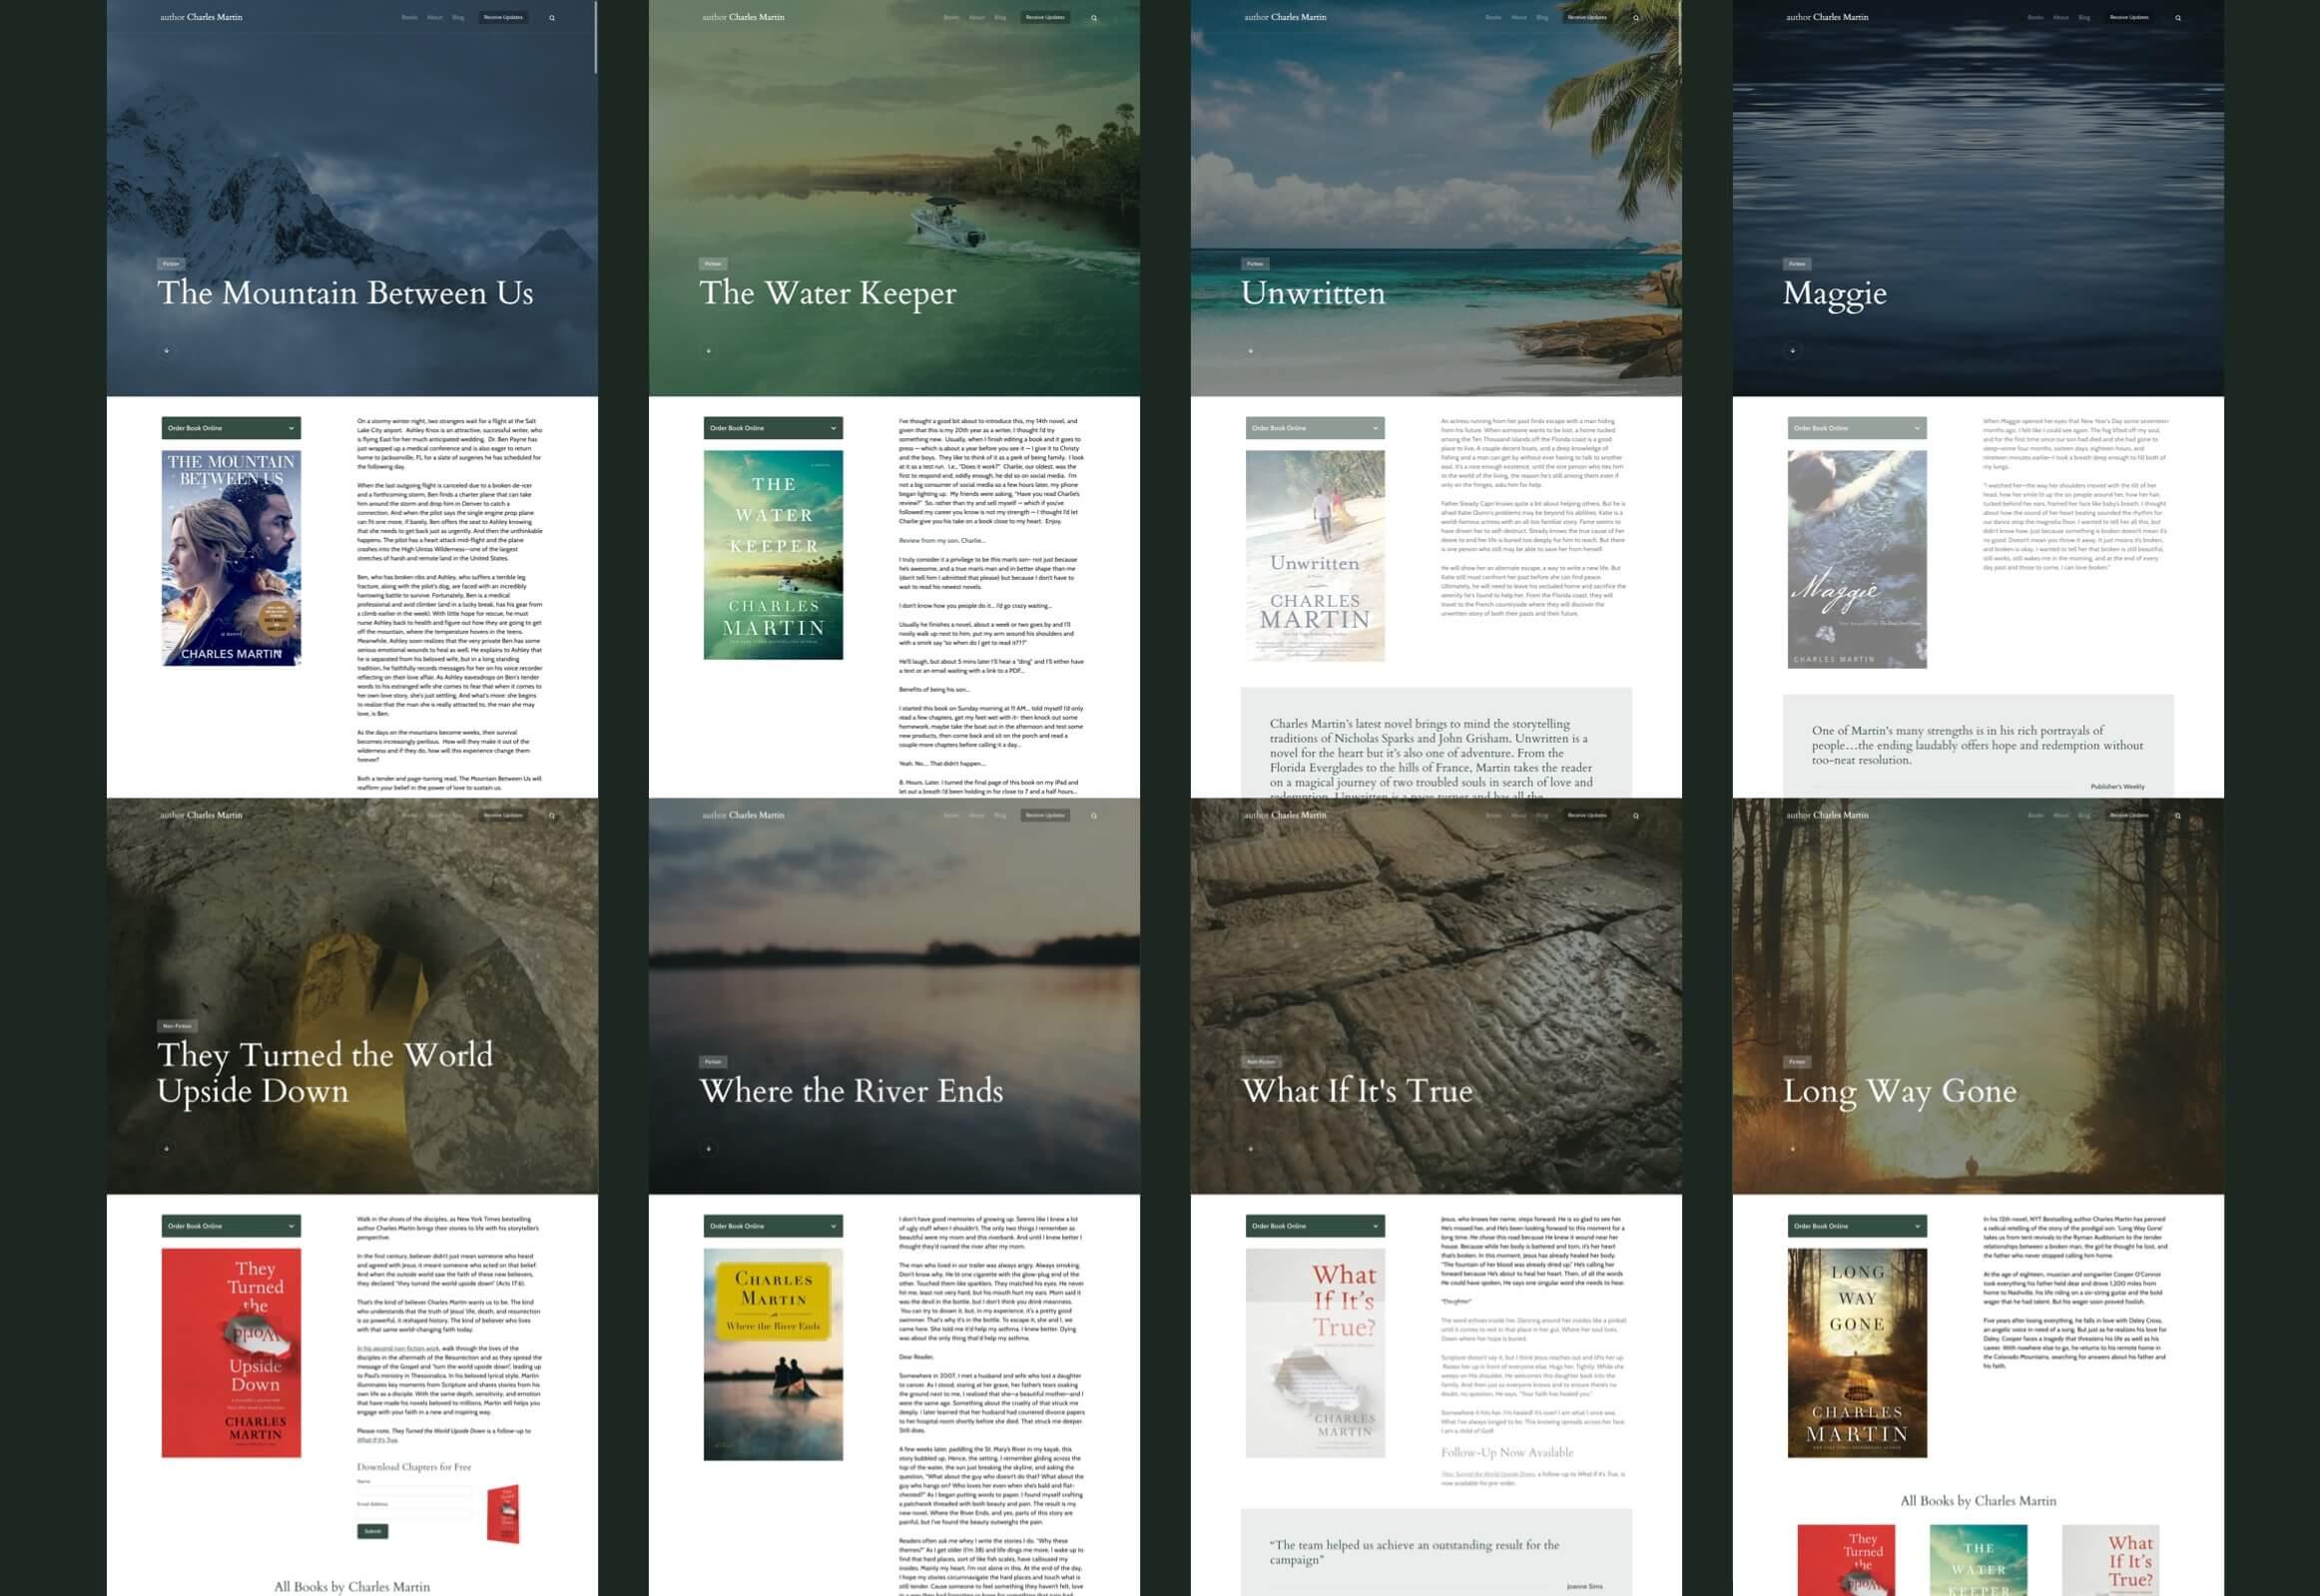 Screen shots of Charles Martin books